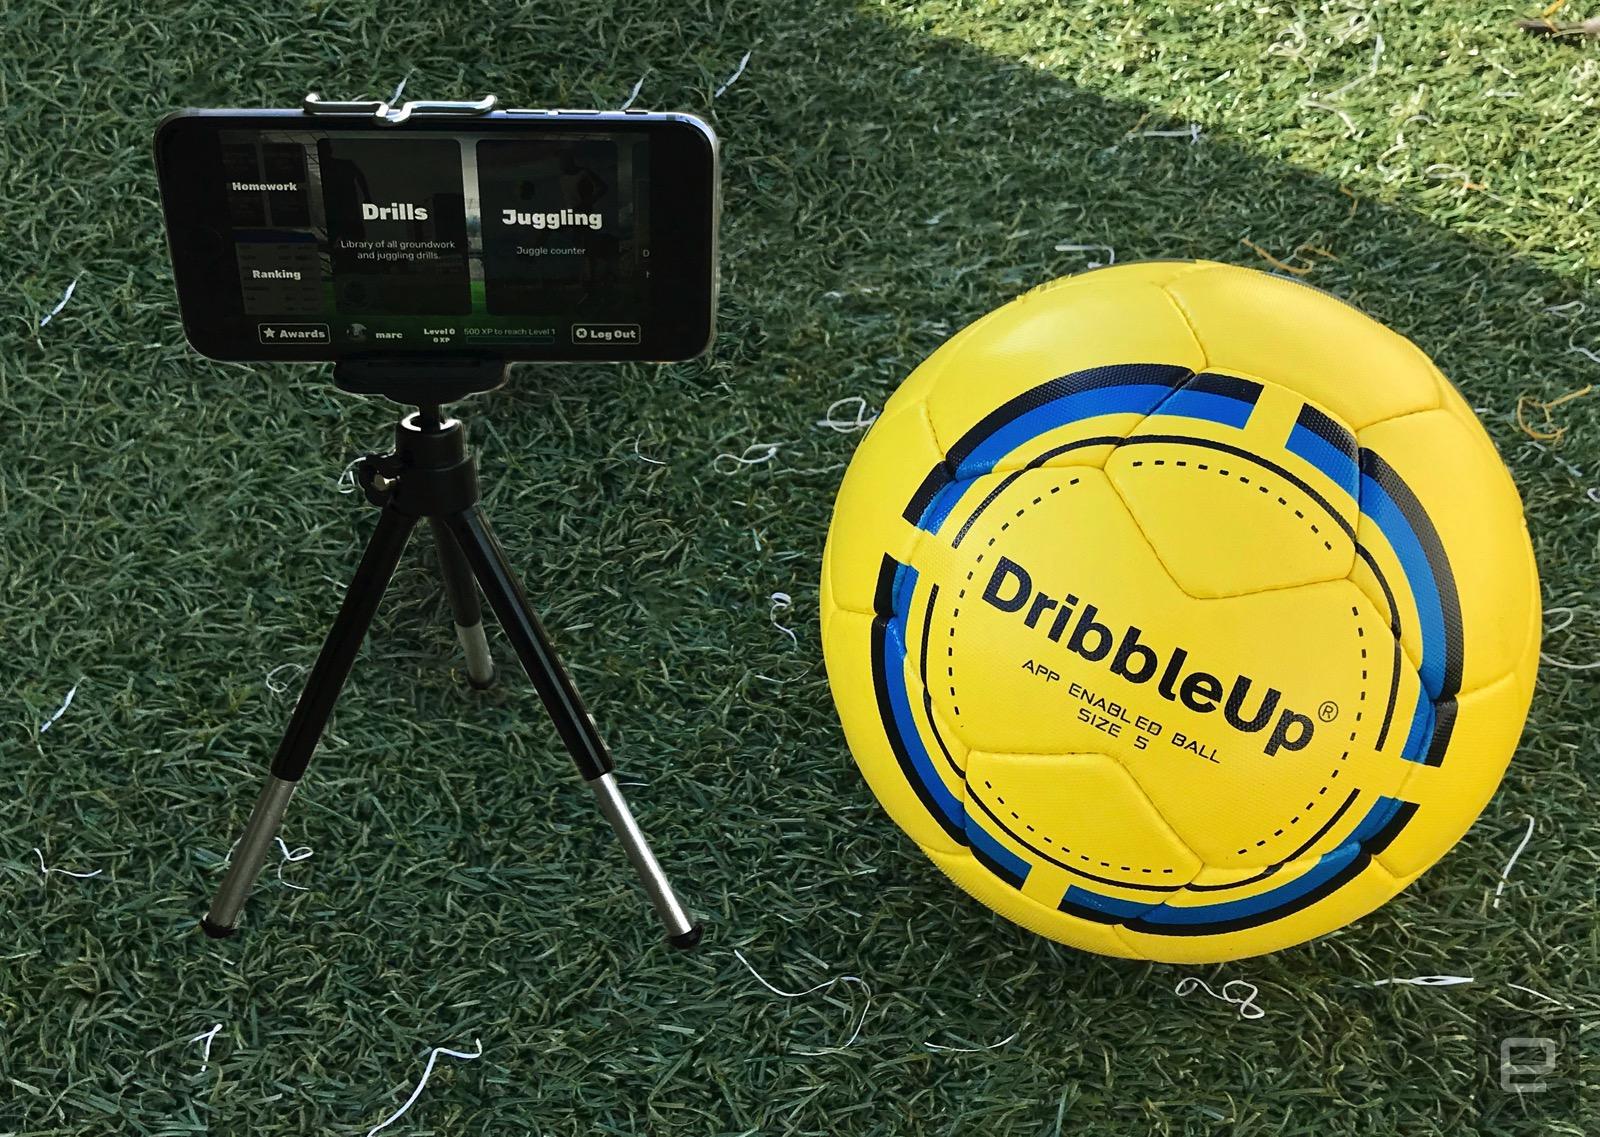 DribbleUp smart ball